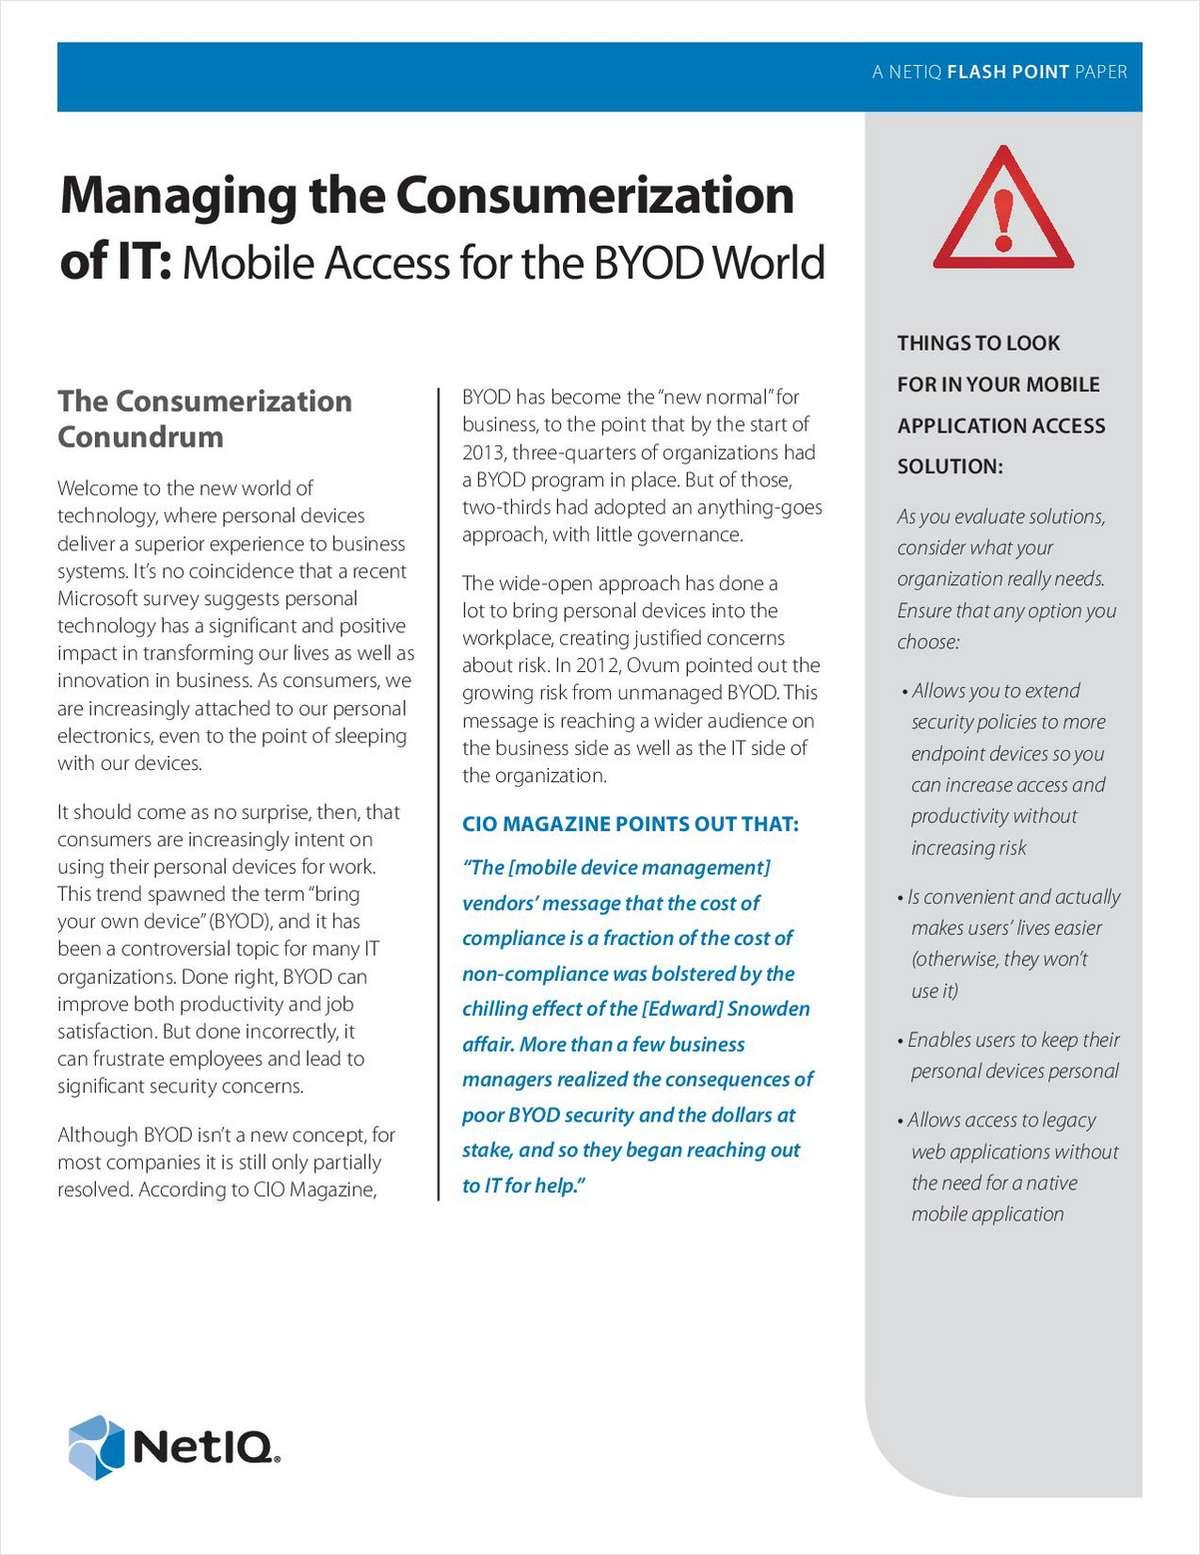 Managing the Consumerization of IT